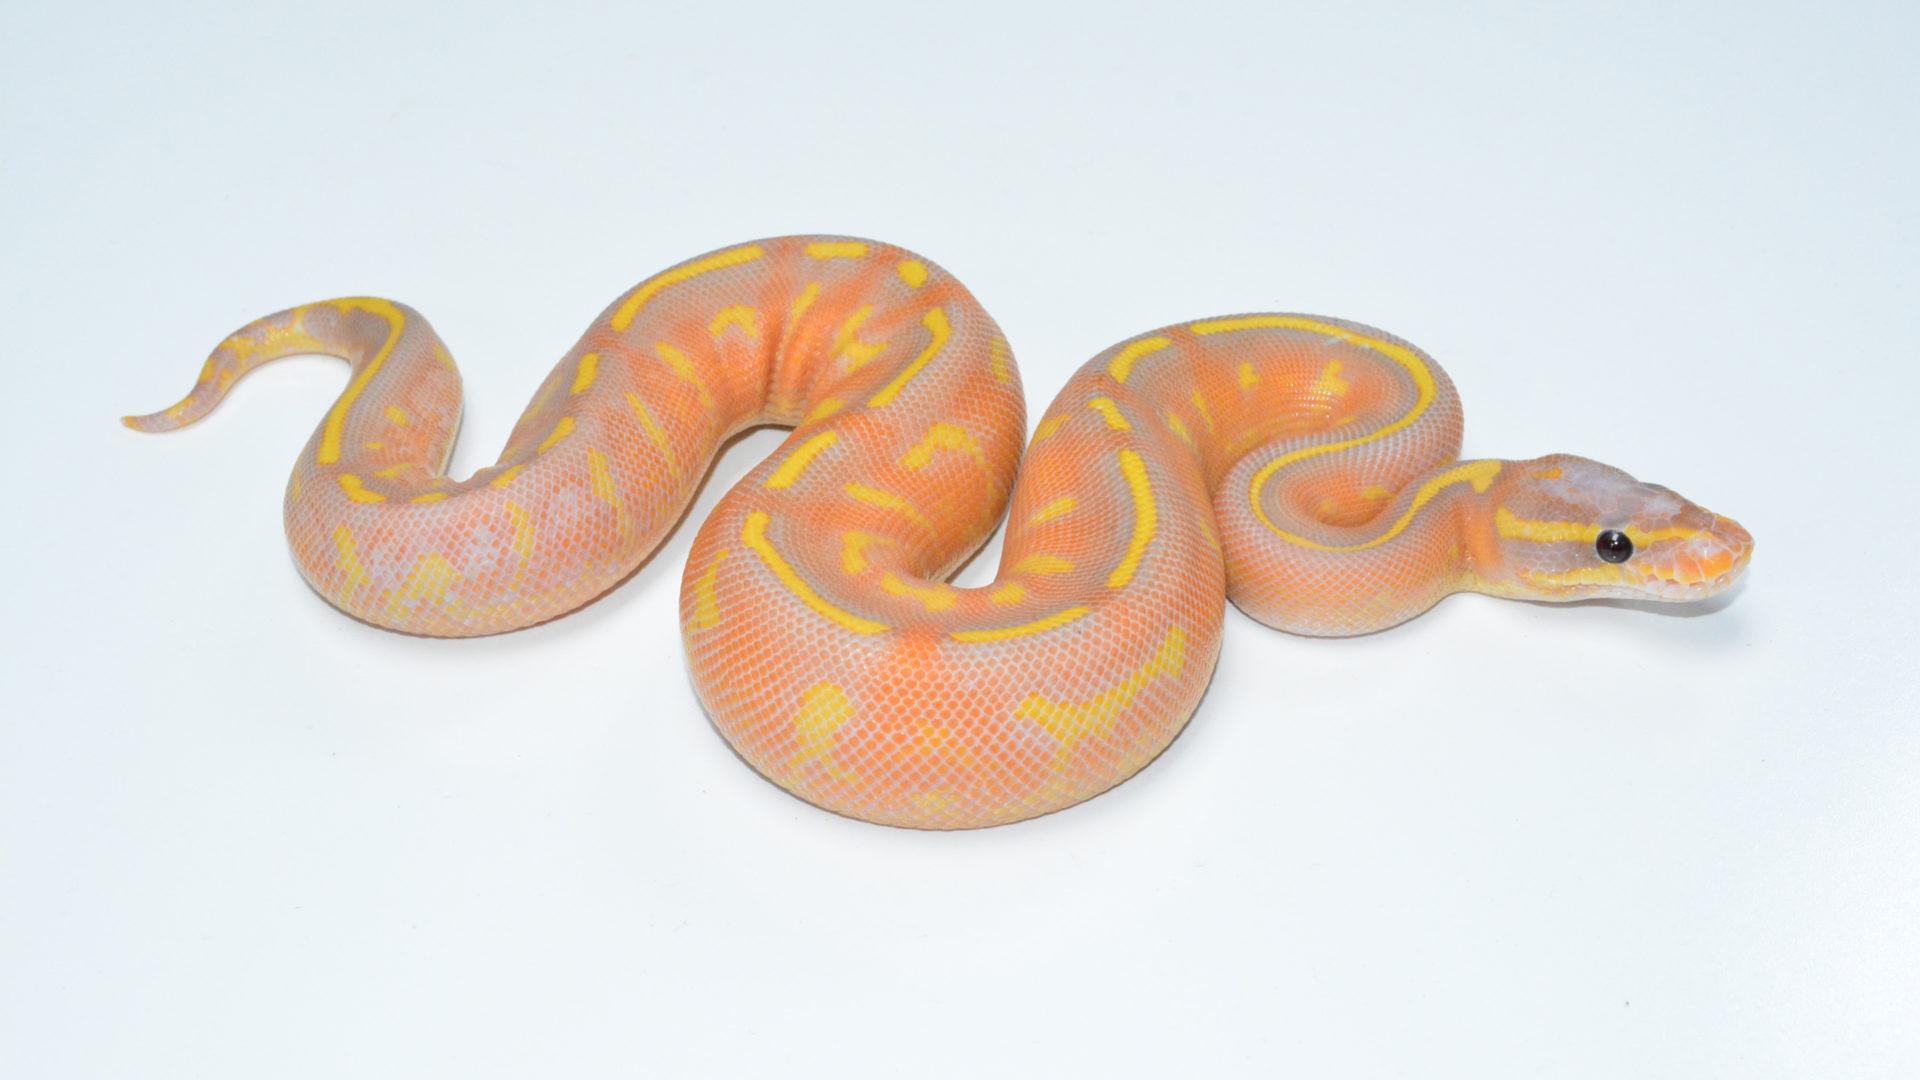 ball pythons – Genetically Diverse Ball Pythons